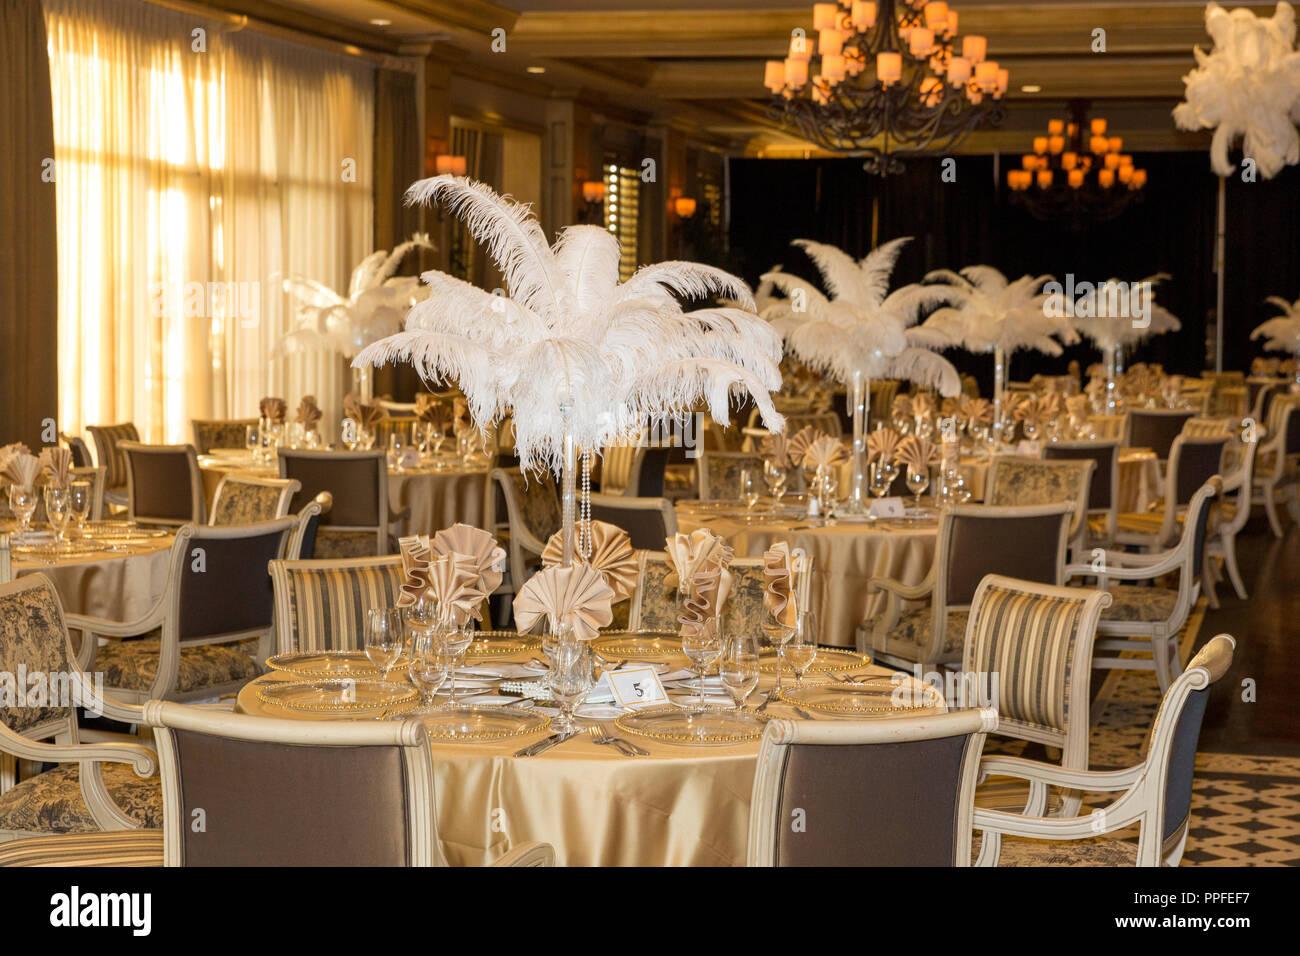 'The Great Gatsby' themed party decor, Naples, Florida, USA Stock Photo